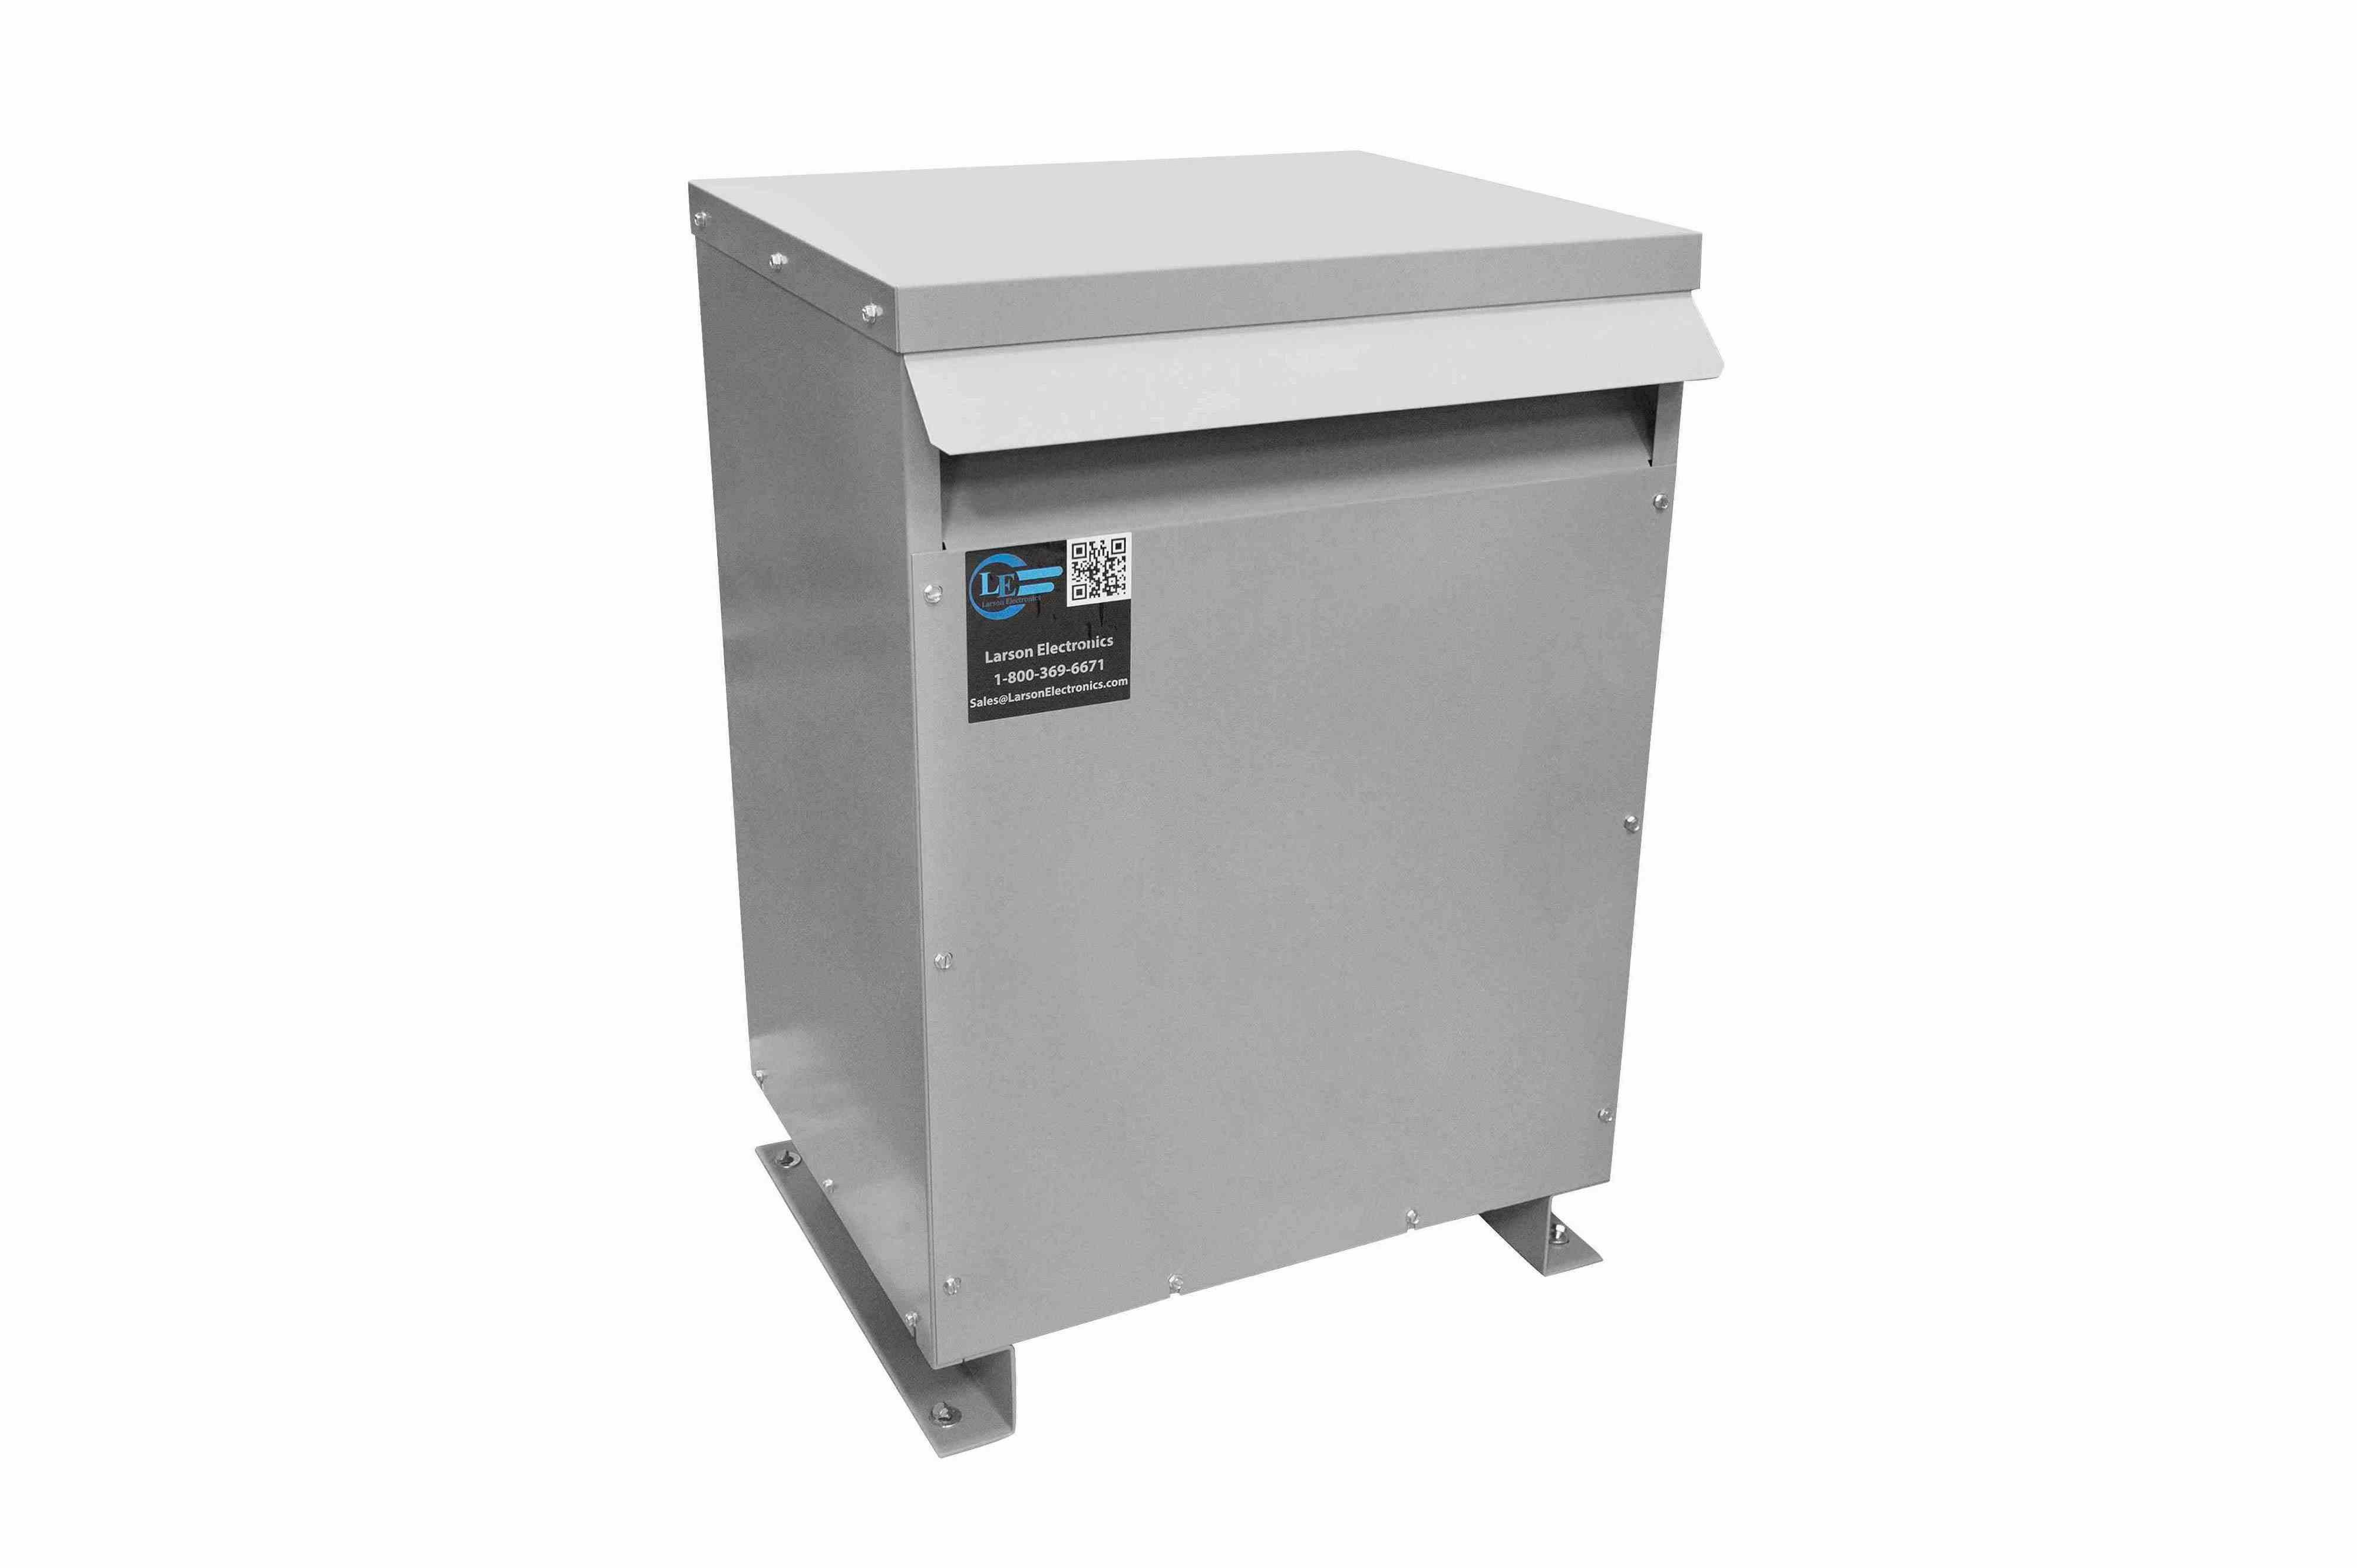 100 kVA 3PH DOE Transformer, 240V Delta Primary, 575Y/332 Wye-N Secondary, N3R, Ventilated, 60 Hz